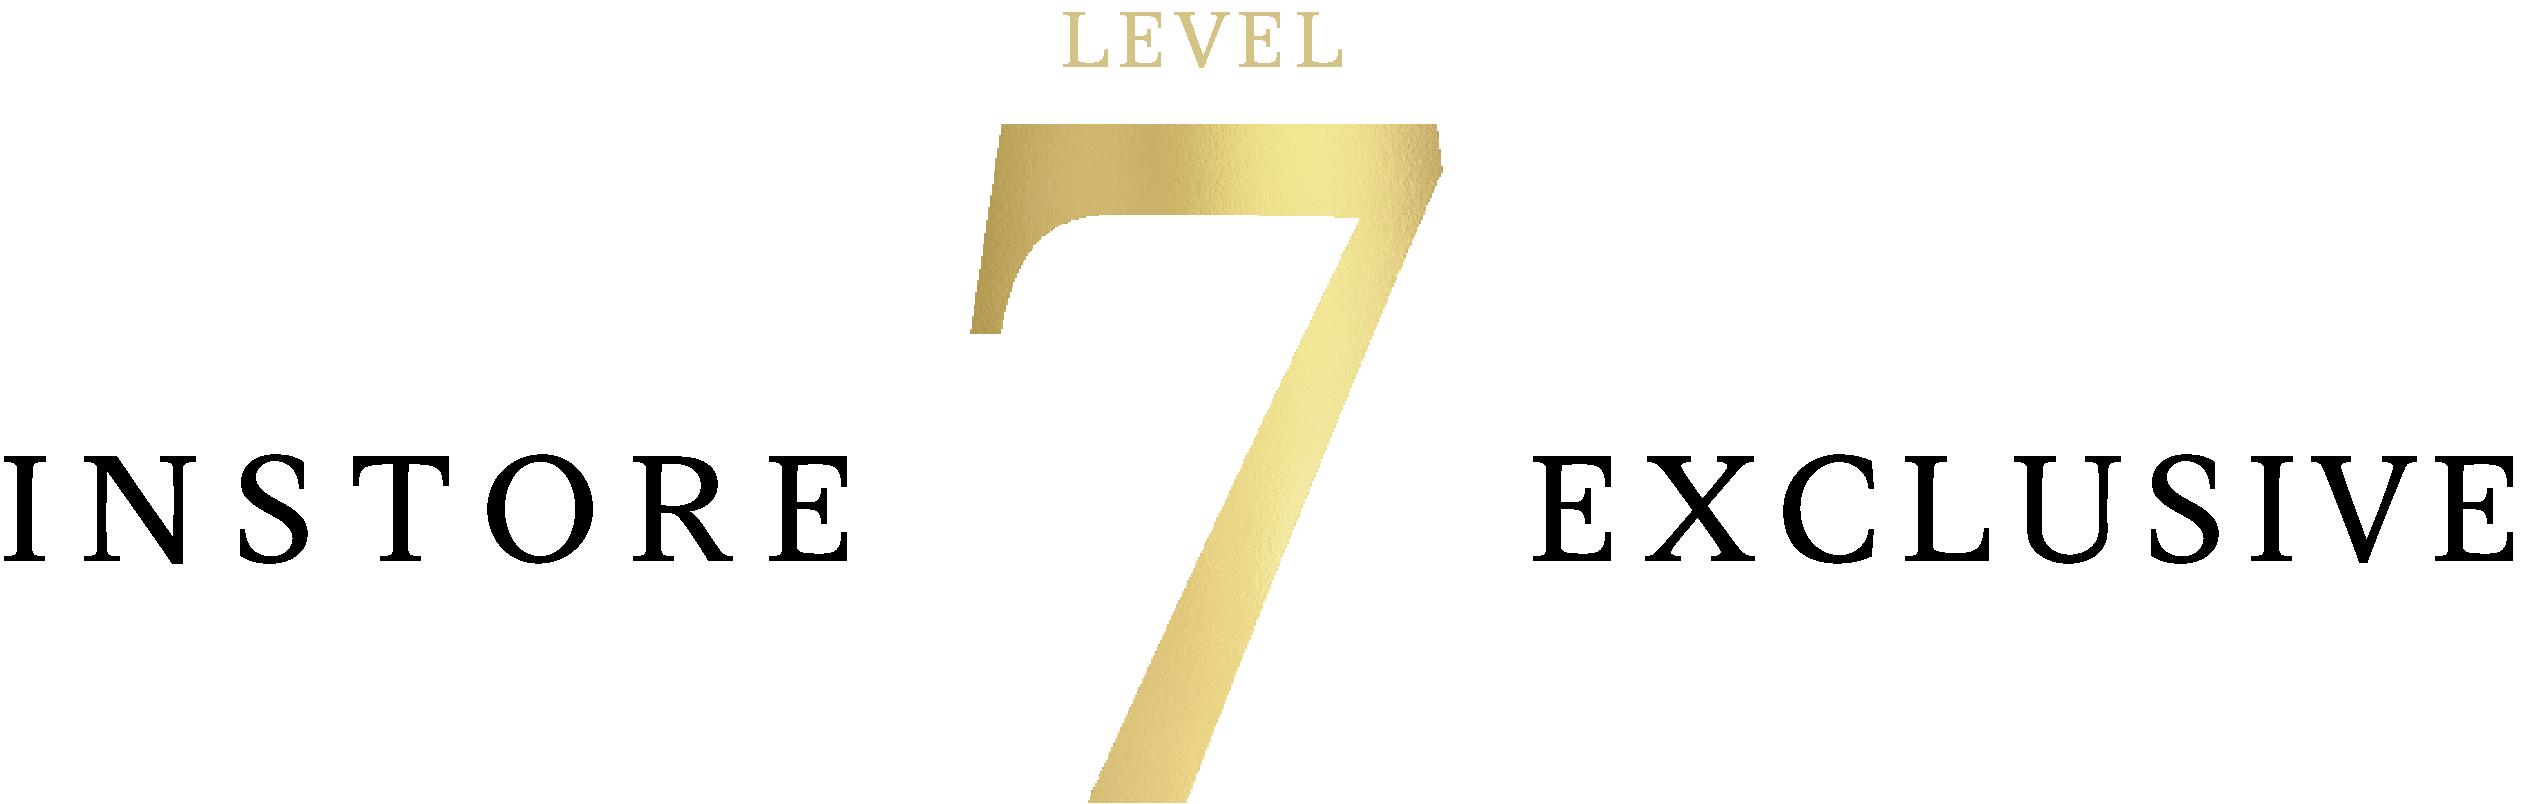 level 7 instore exclusive